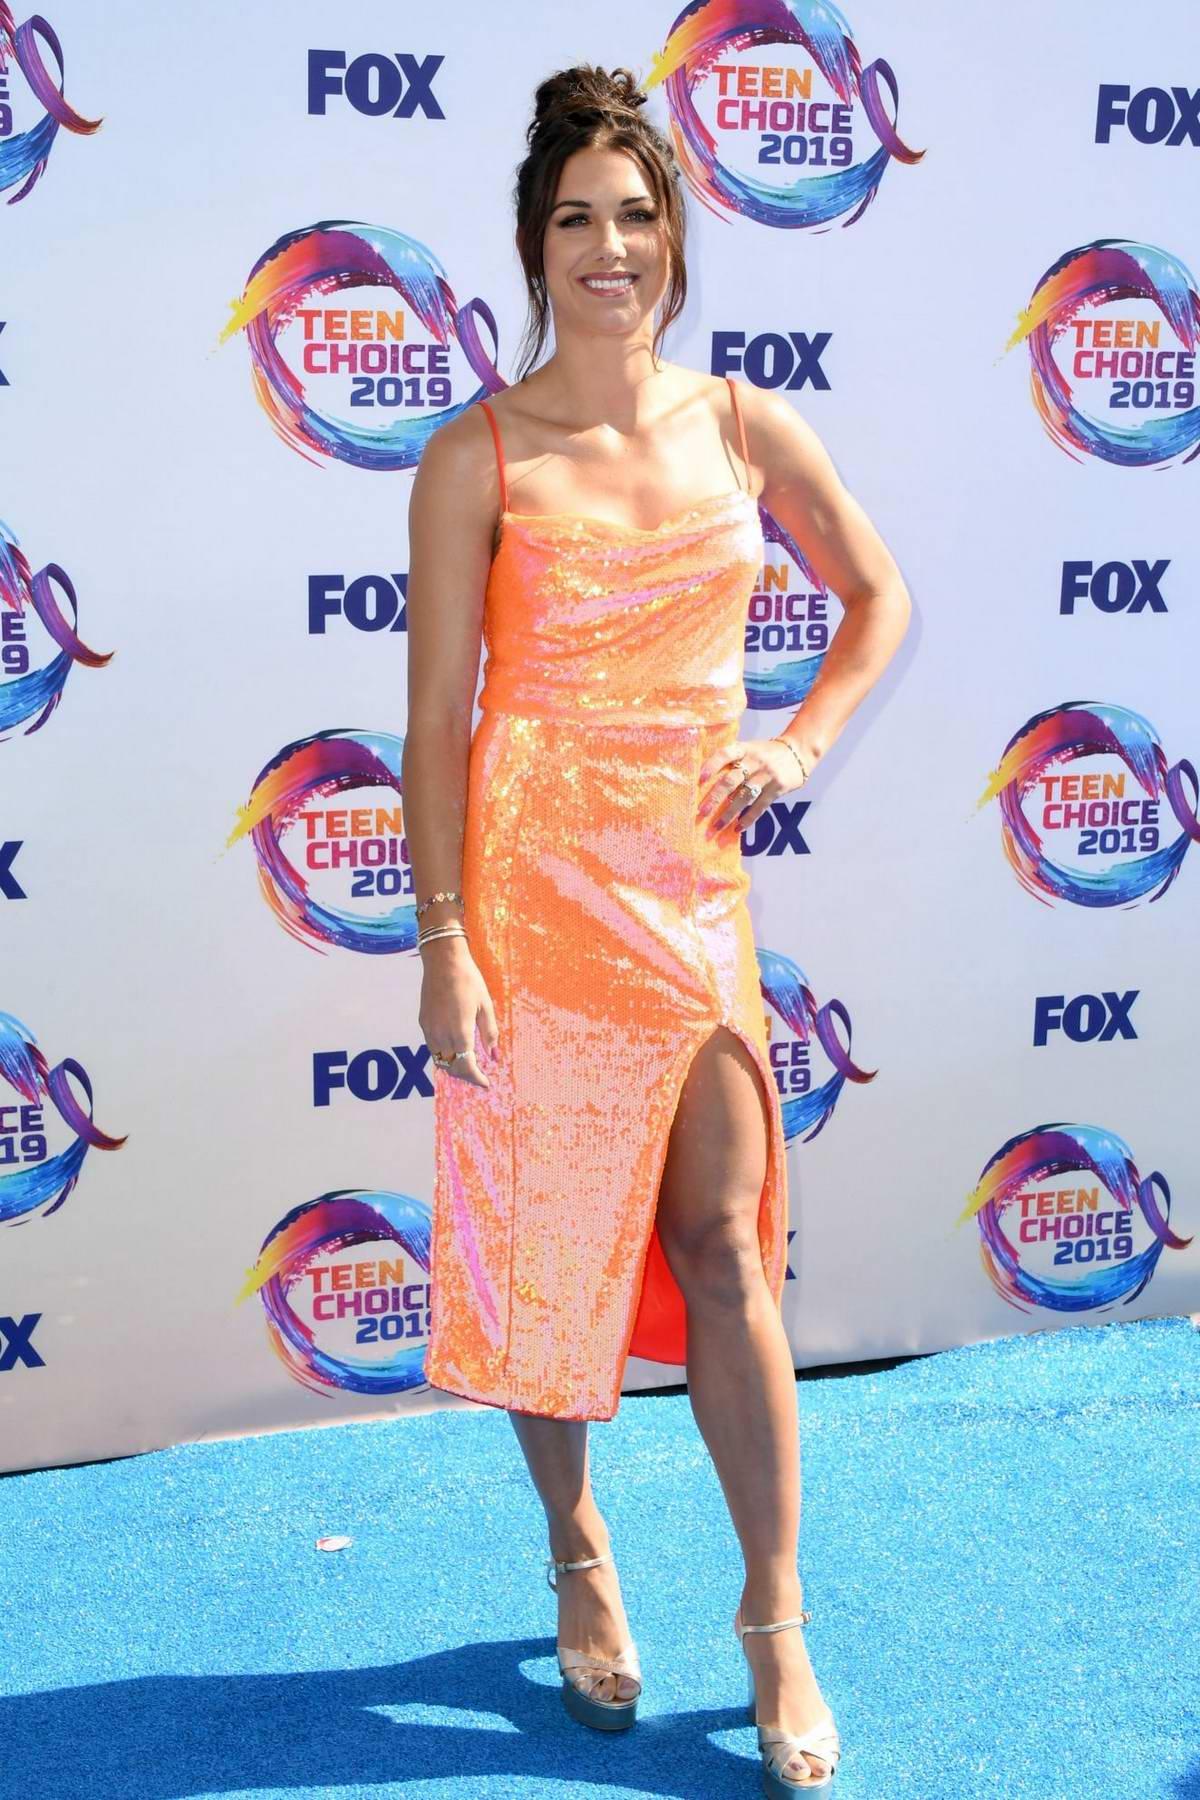 Alex Morgan attends the FOX's Teen Choice Awards 2019 in Hermosa Beach, California